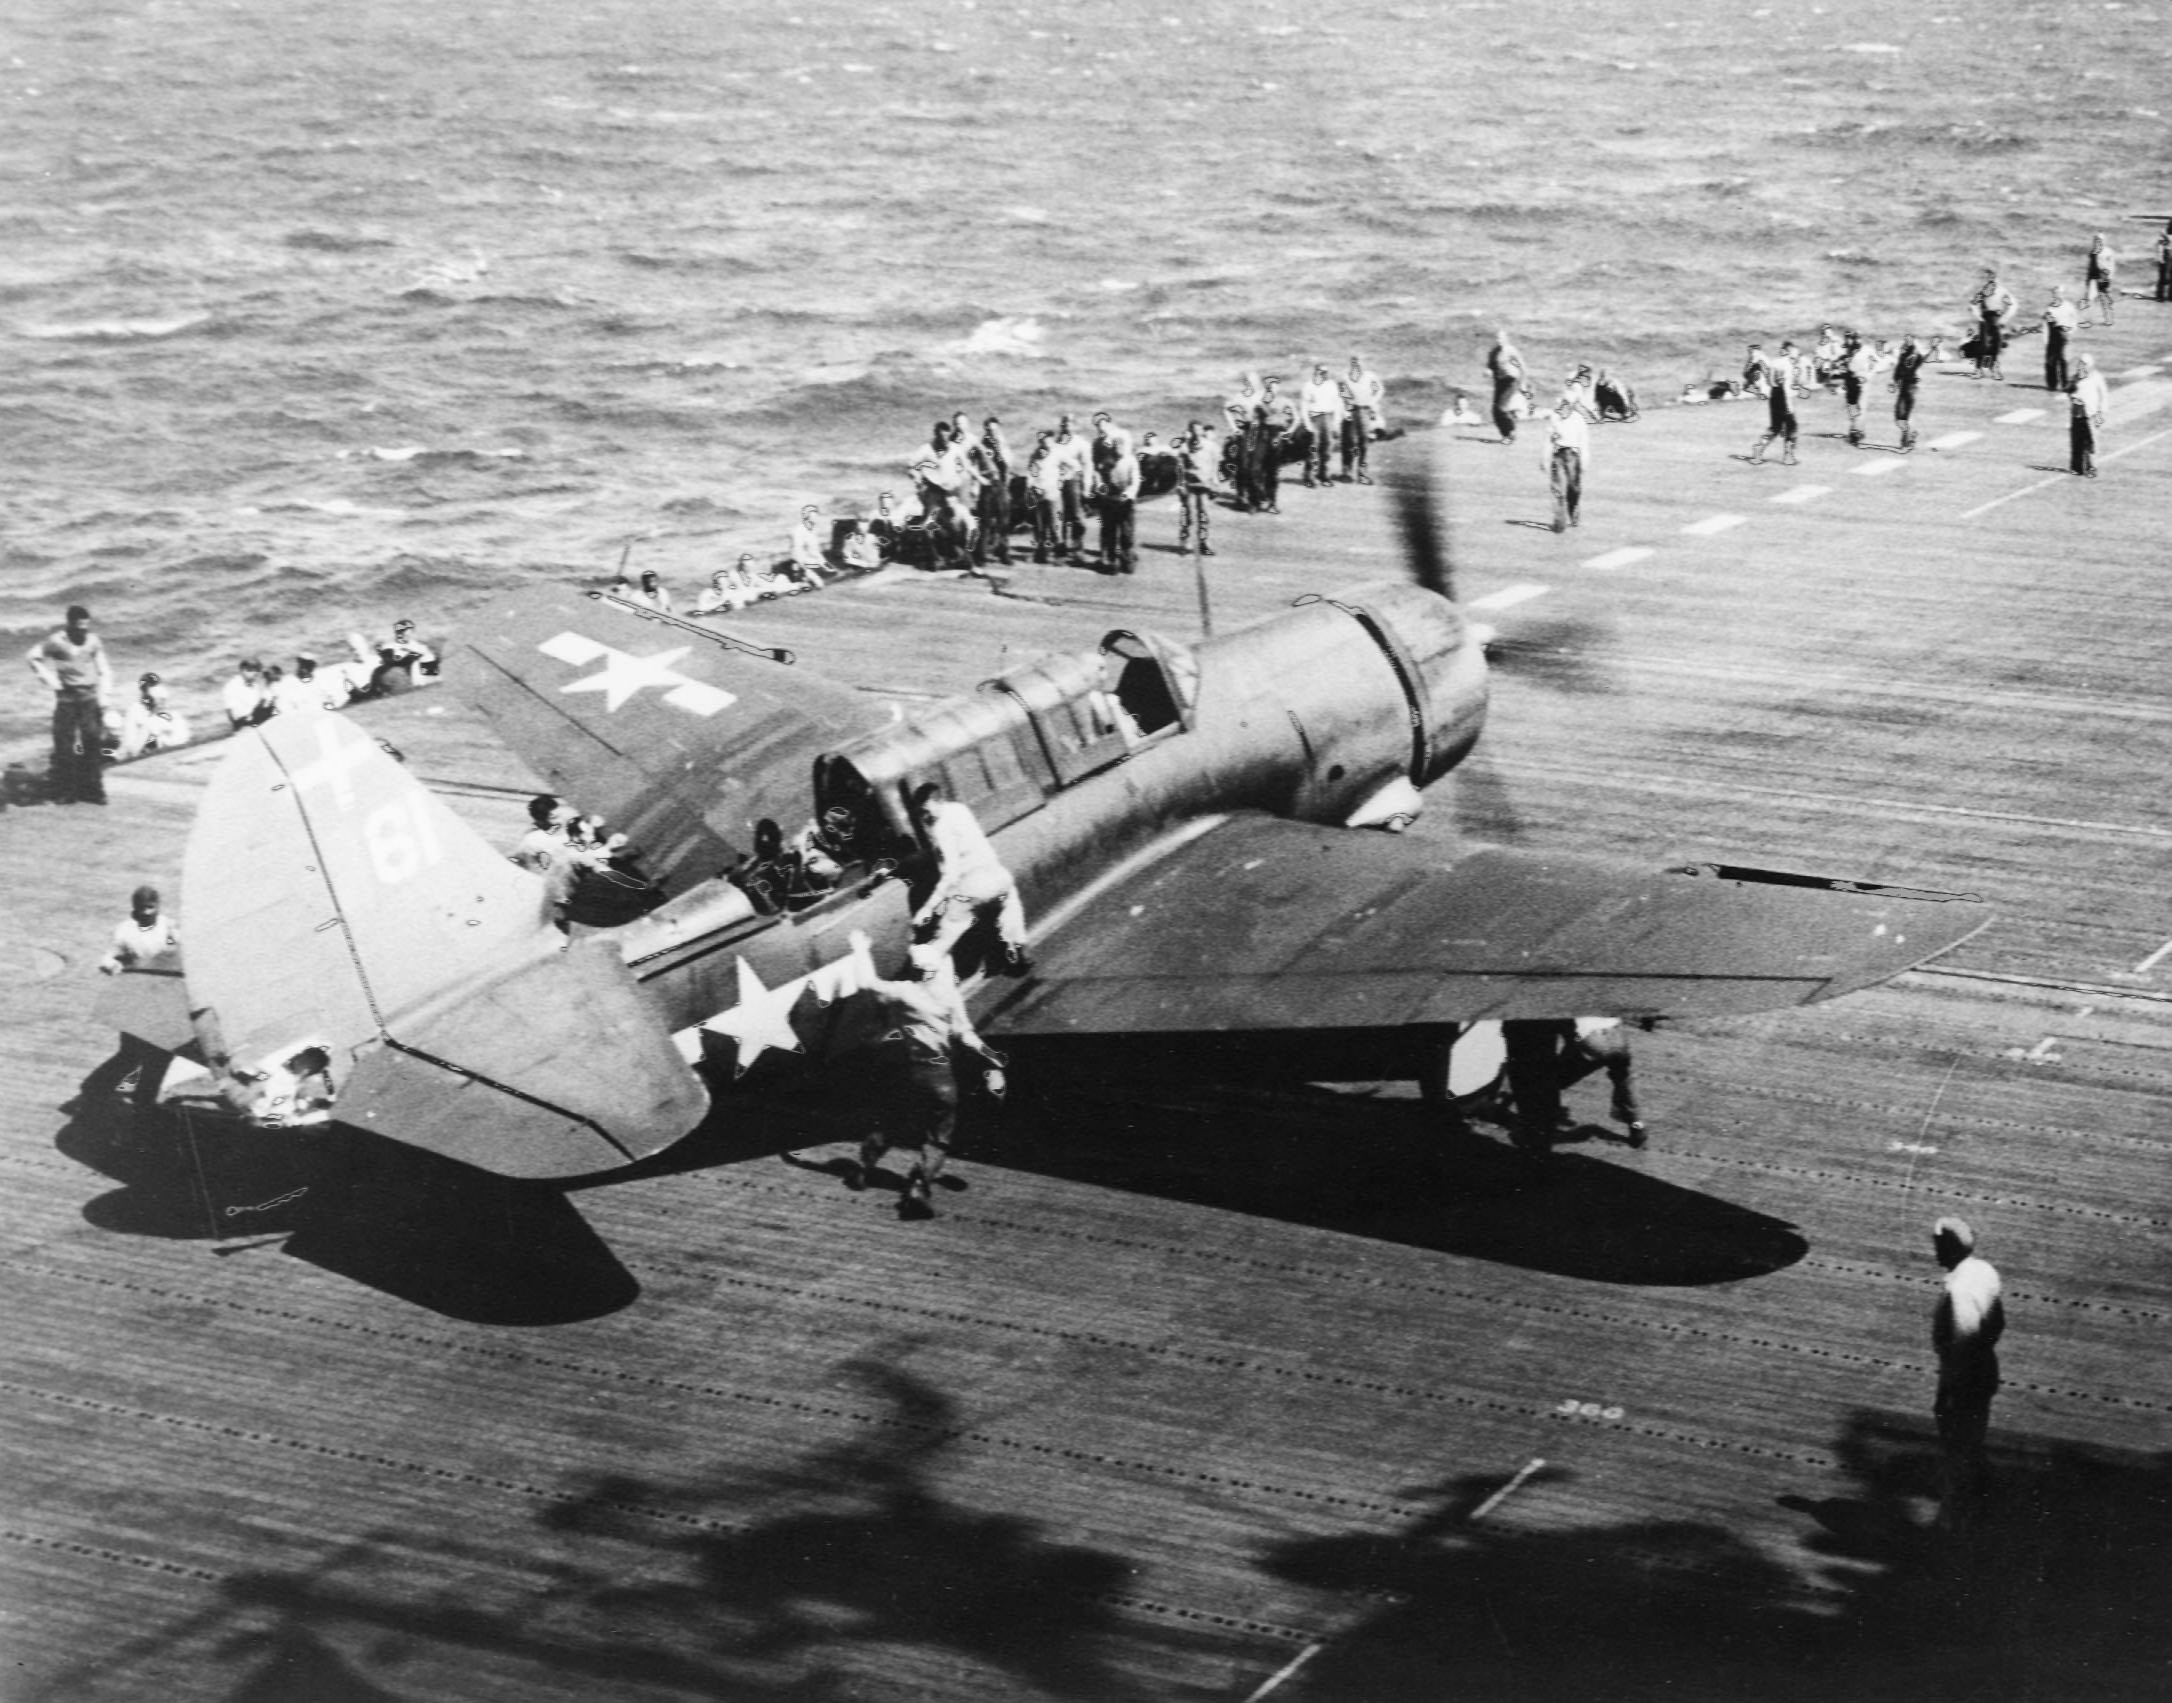 Intrepid Air Craft Carrier After